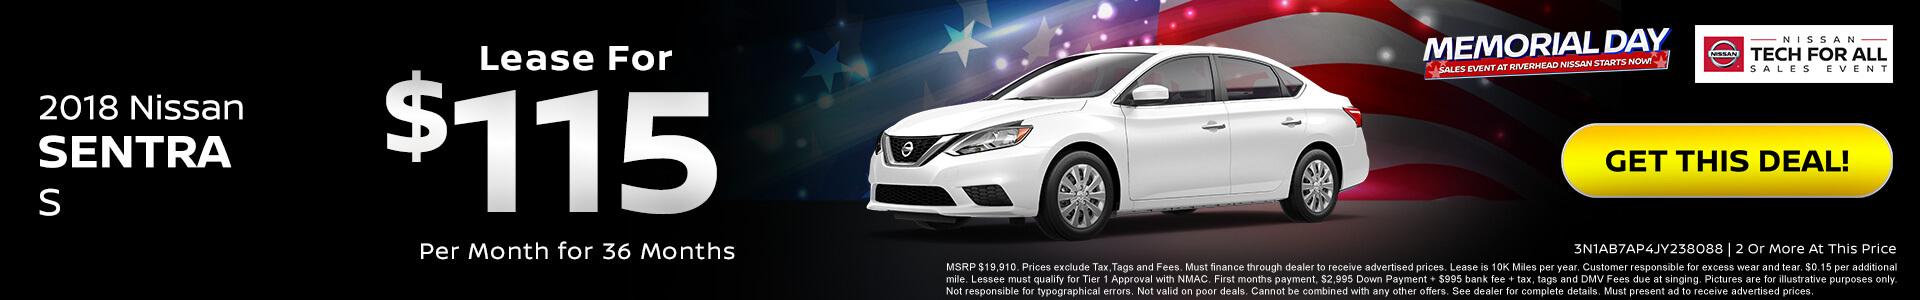 Nissan Sentra $115 Lease